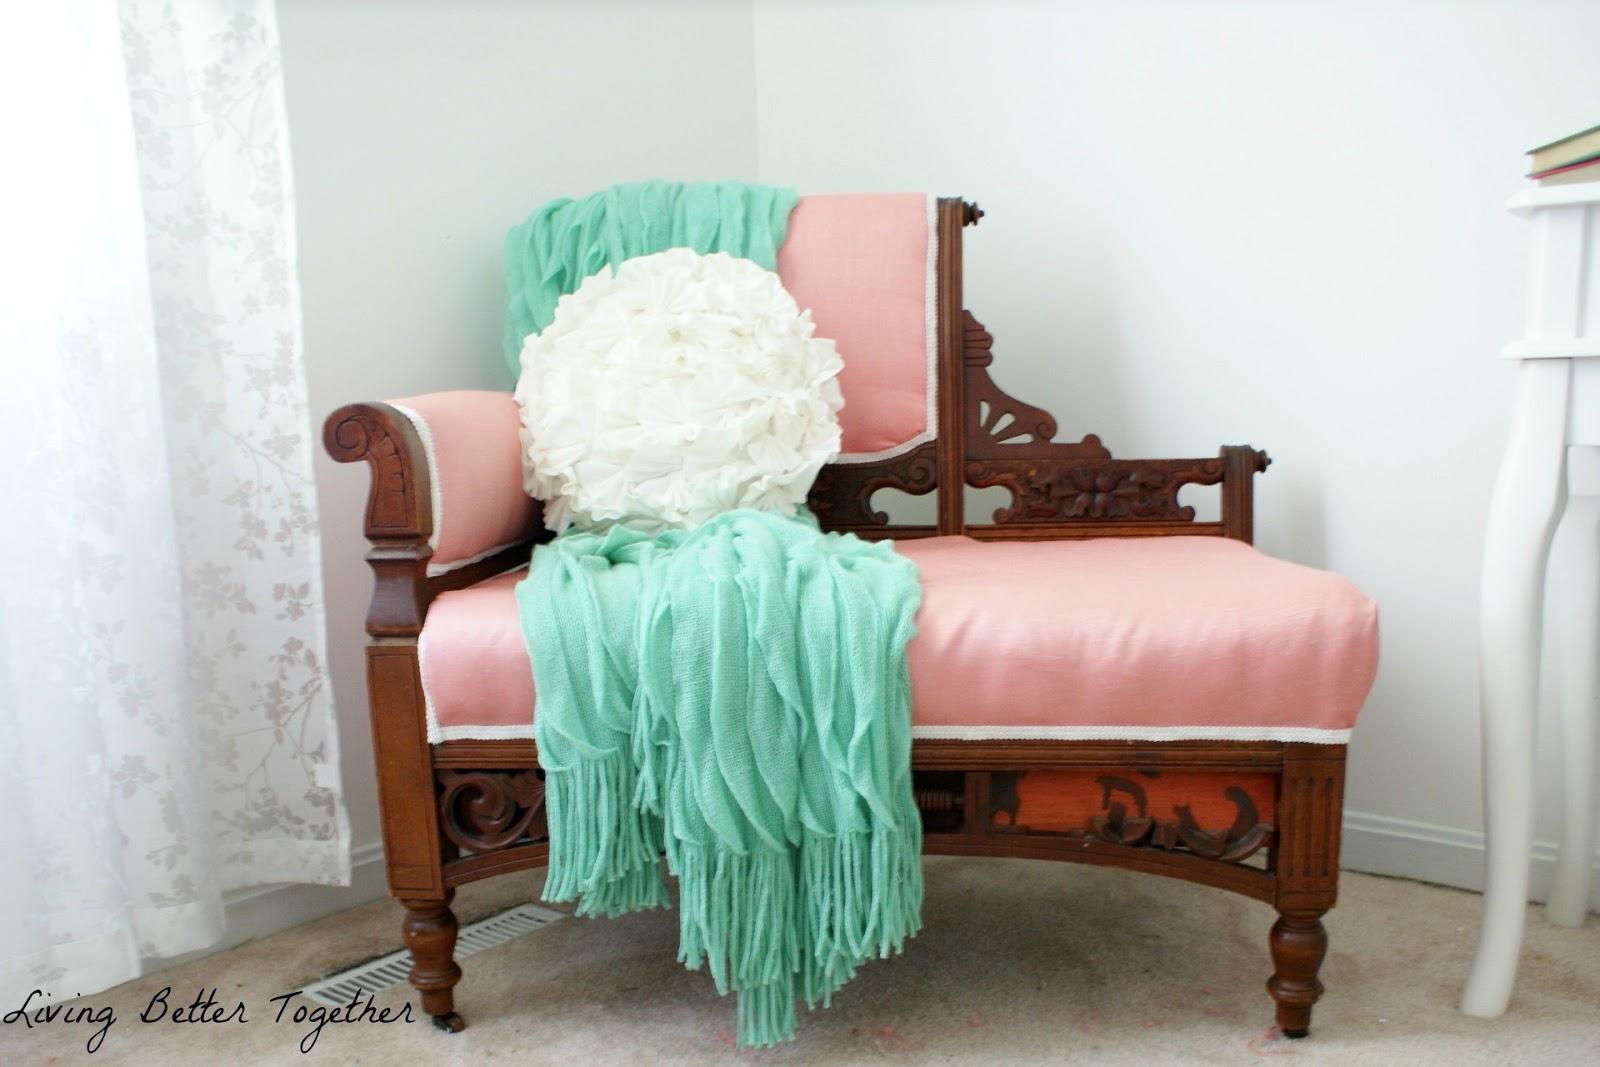 vintage chair Living Better Together